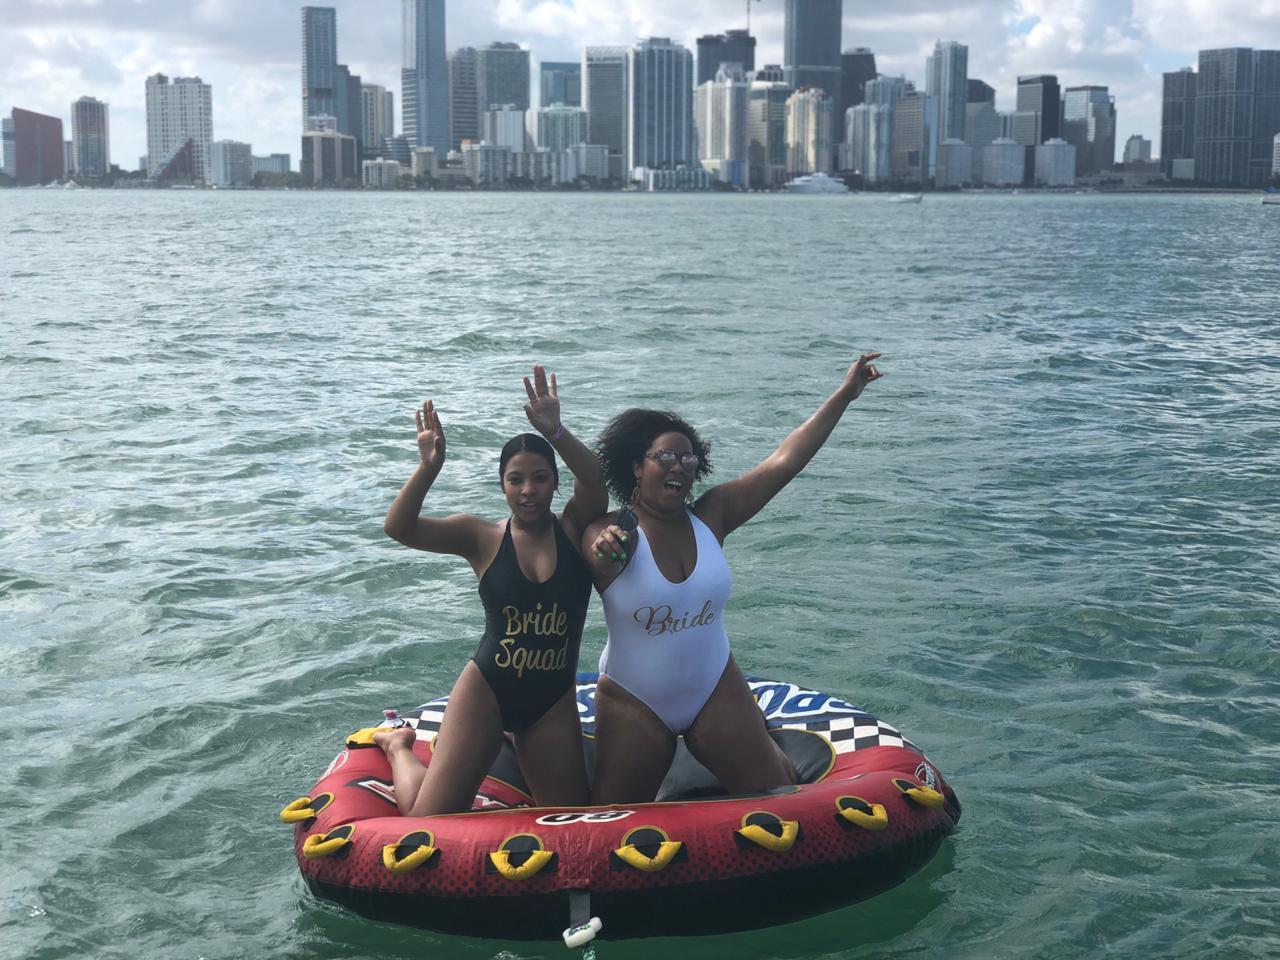 Miami Booze Cruise | Tickets & Information - Miami Turn Up Entertainment